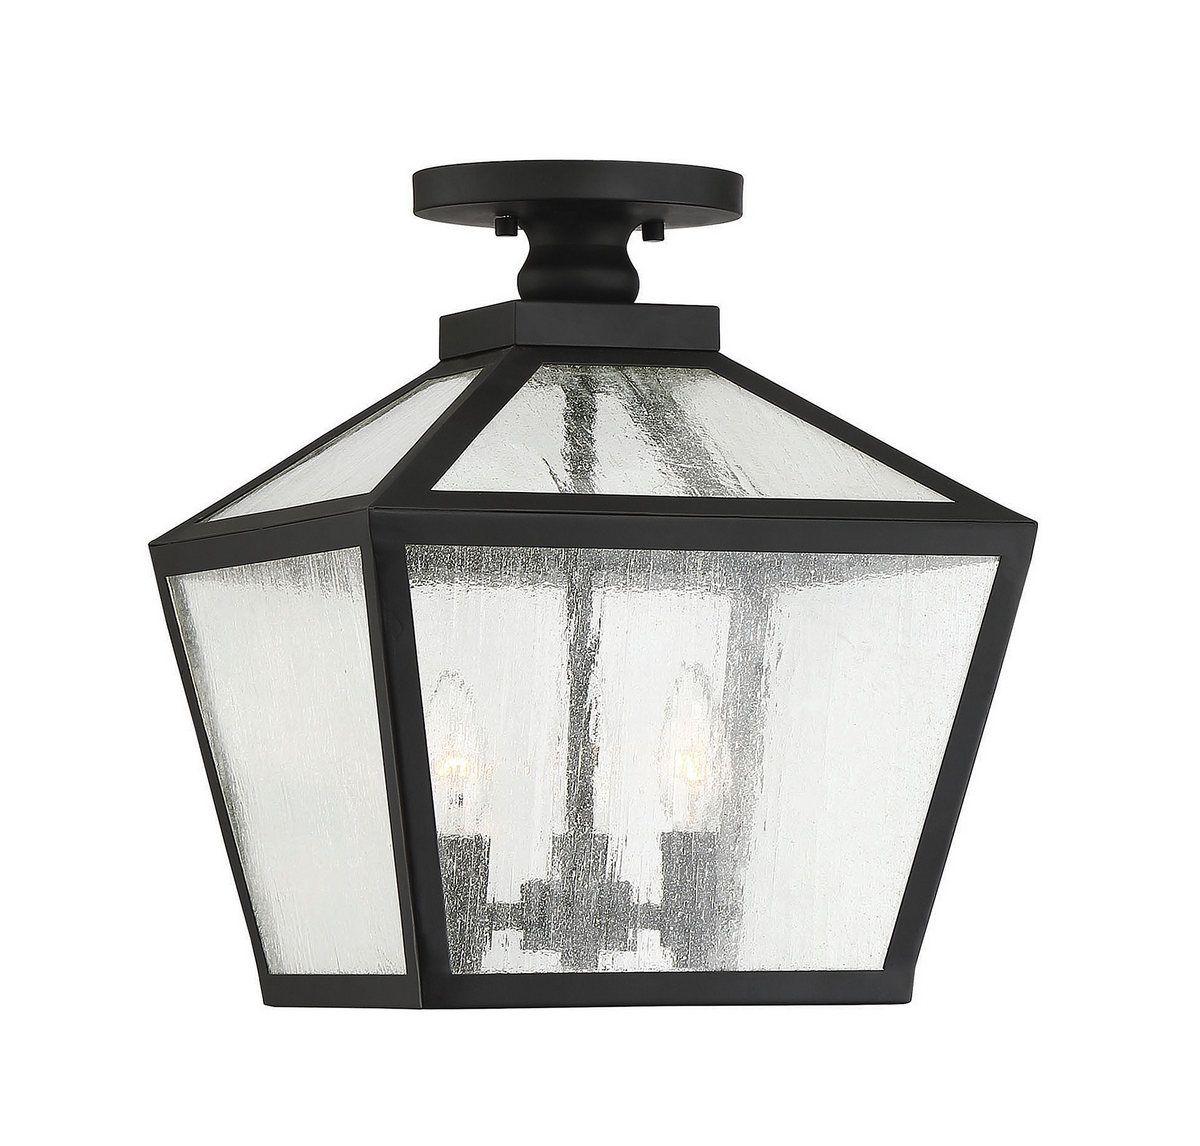 Woodstock Outdoor Ceiling Light Fixture Lantern By Savoy House 5 105 Bk